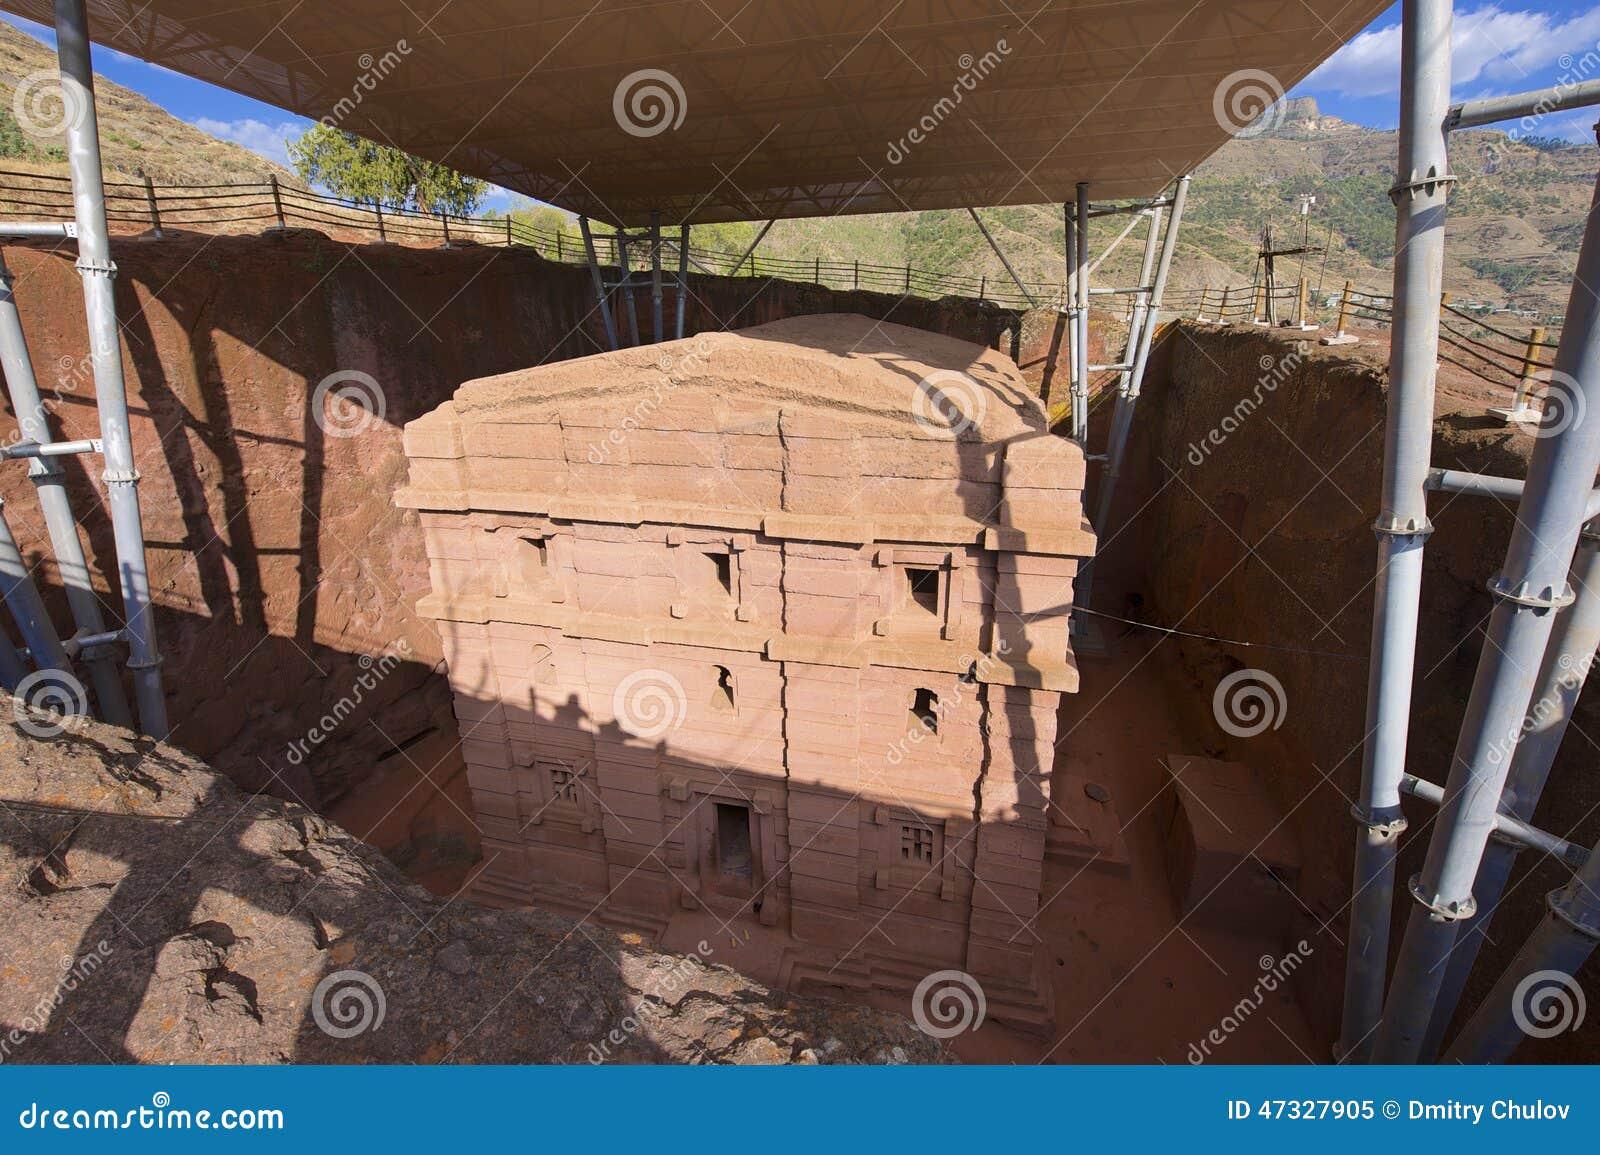 Unique monolithic rock-hewn church, Lalibela, Ethiopia. UNESCO World Heritage site.